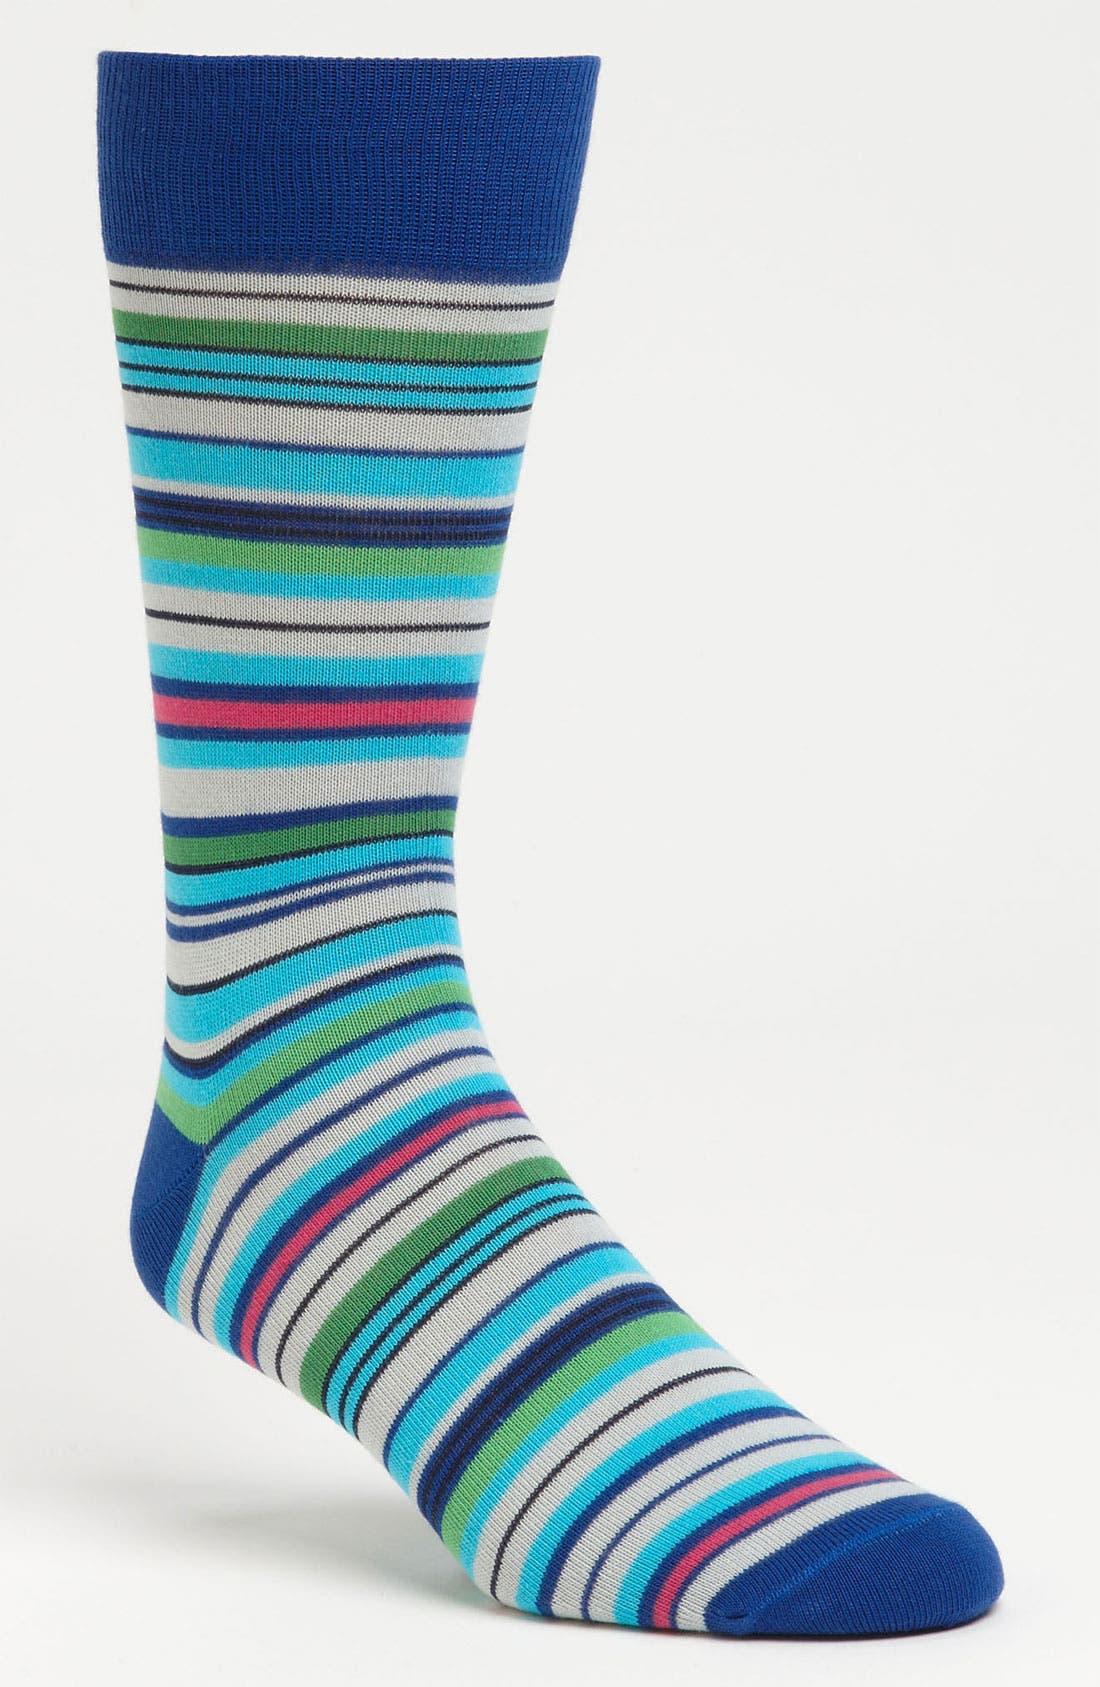 Main Image - Lorenzo Uomo Multi Stripe Socks